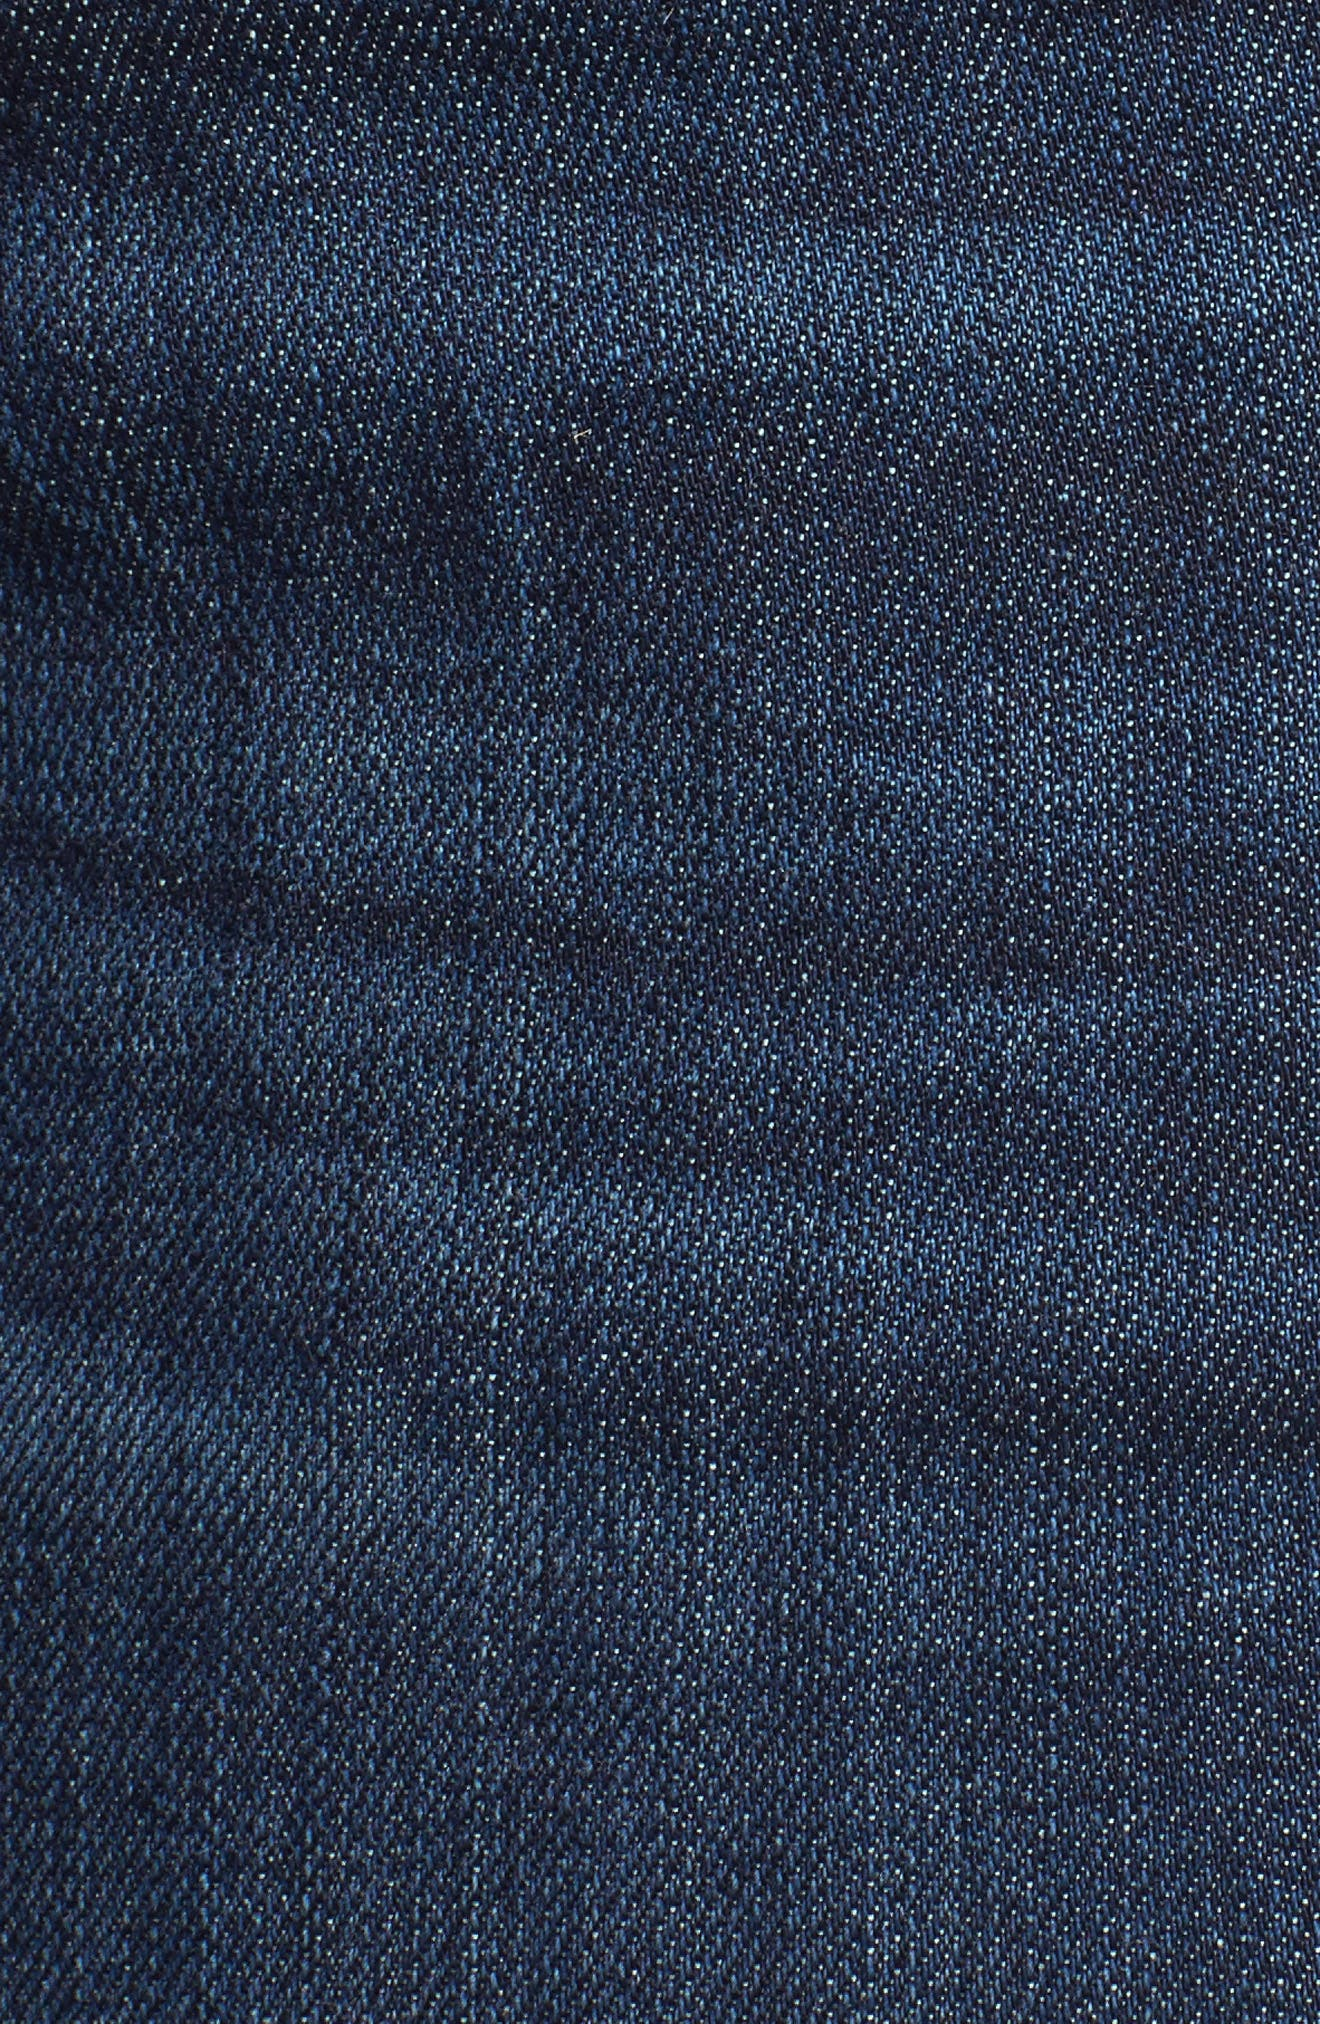 Catherine Boyfriend Jeans,                             Alternate thumbnail 6, color,                             400